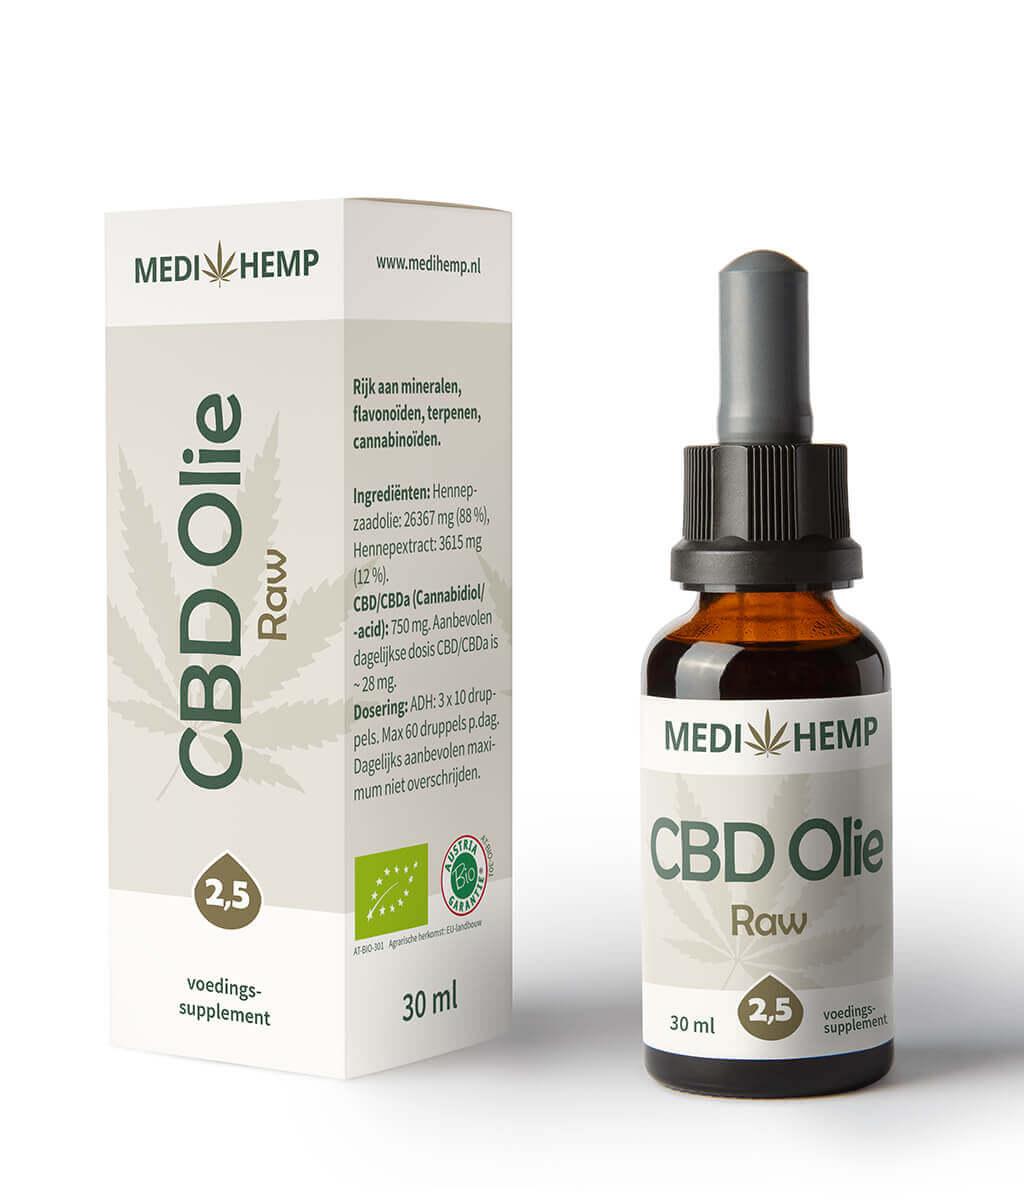 CBD Olie 2,5% 30ml (Medihemp) Raw